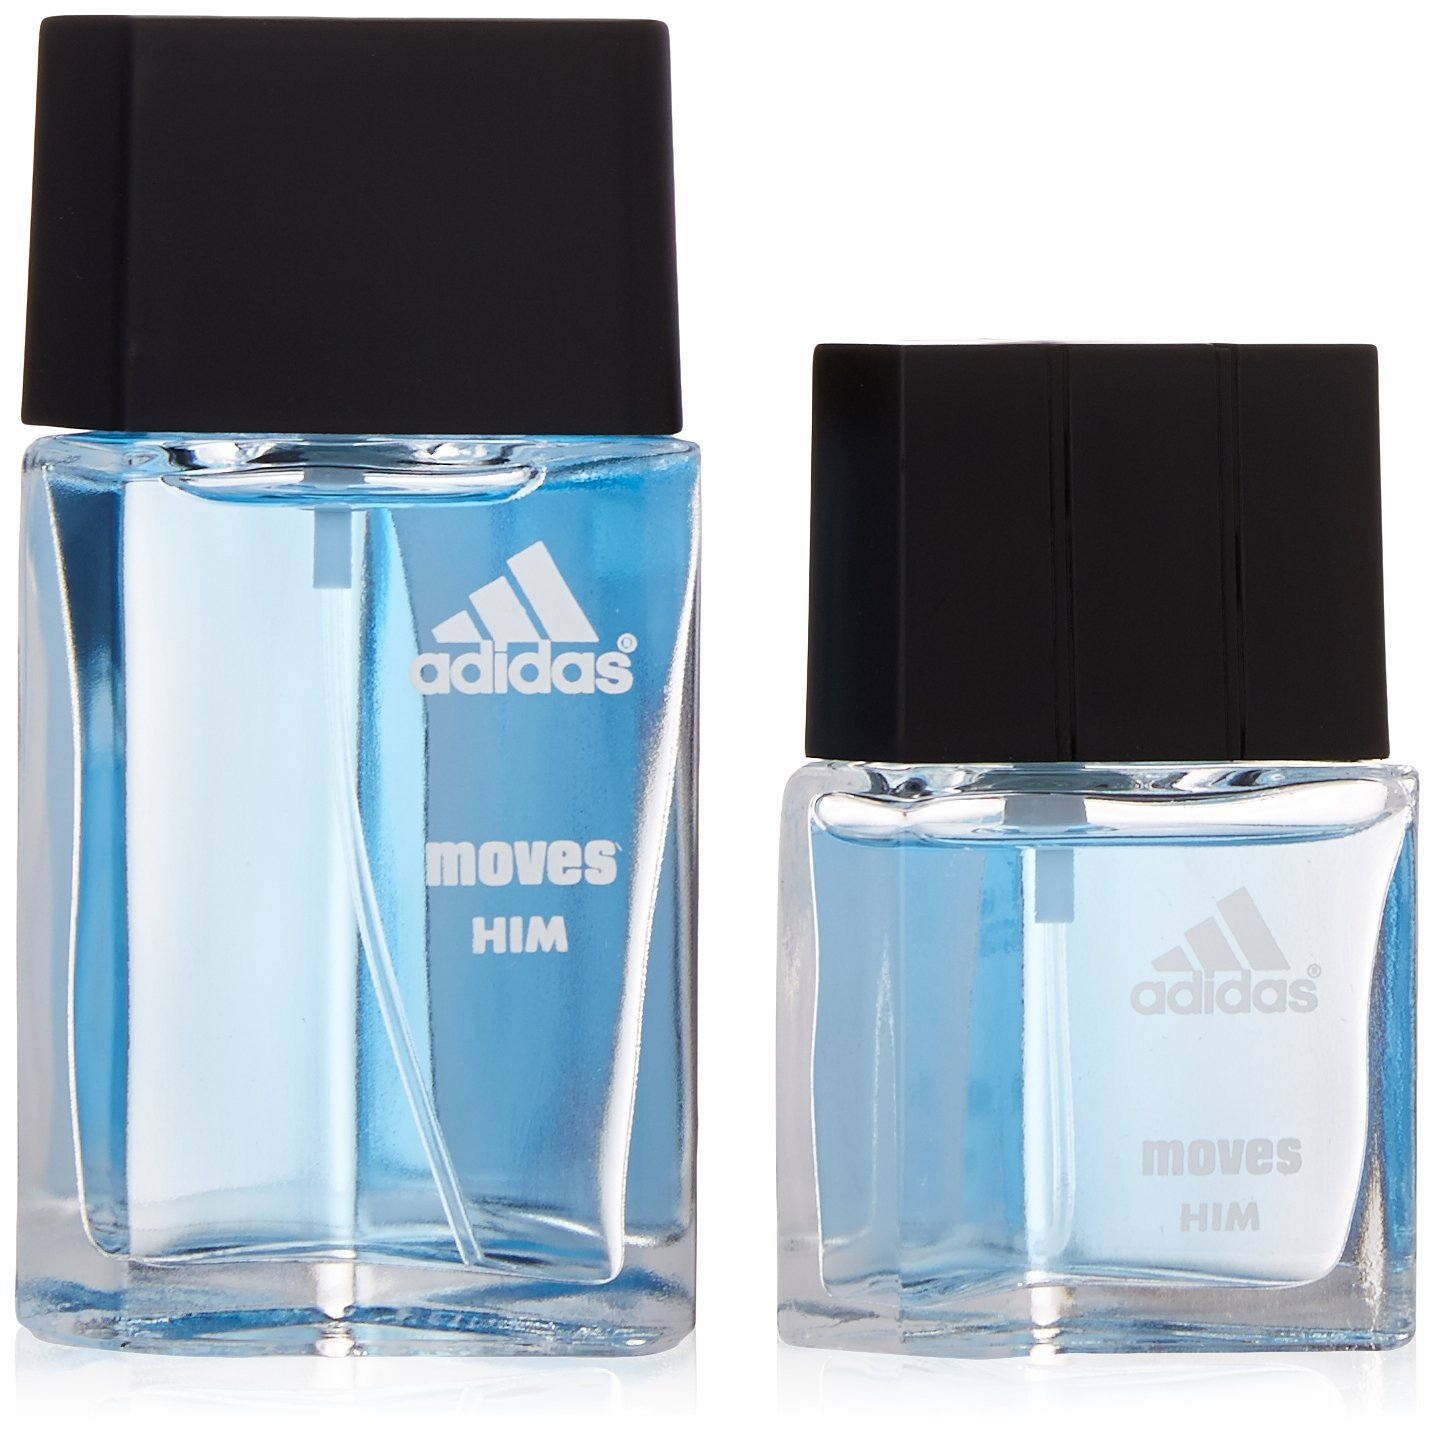 Adidas Moves By Adidas For Men. Gift Set ( Eau De Toilette Spray 1.0 Oz + Eau De Toilette Spray 0.5 Oz ) 031655699738